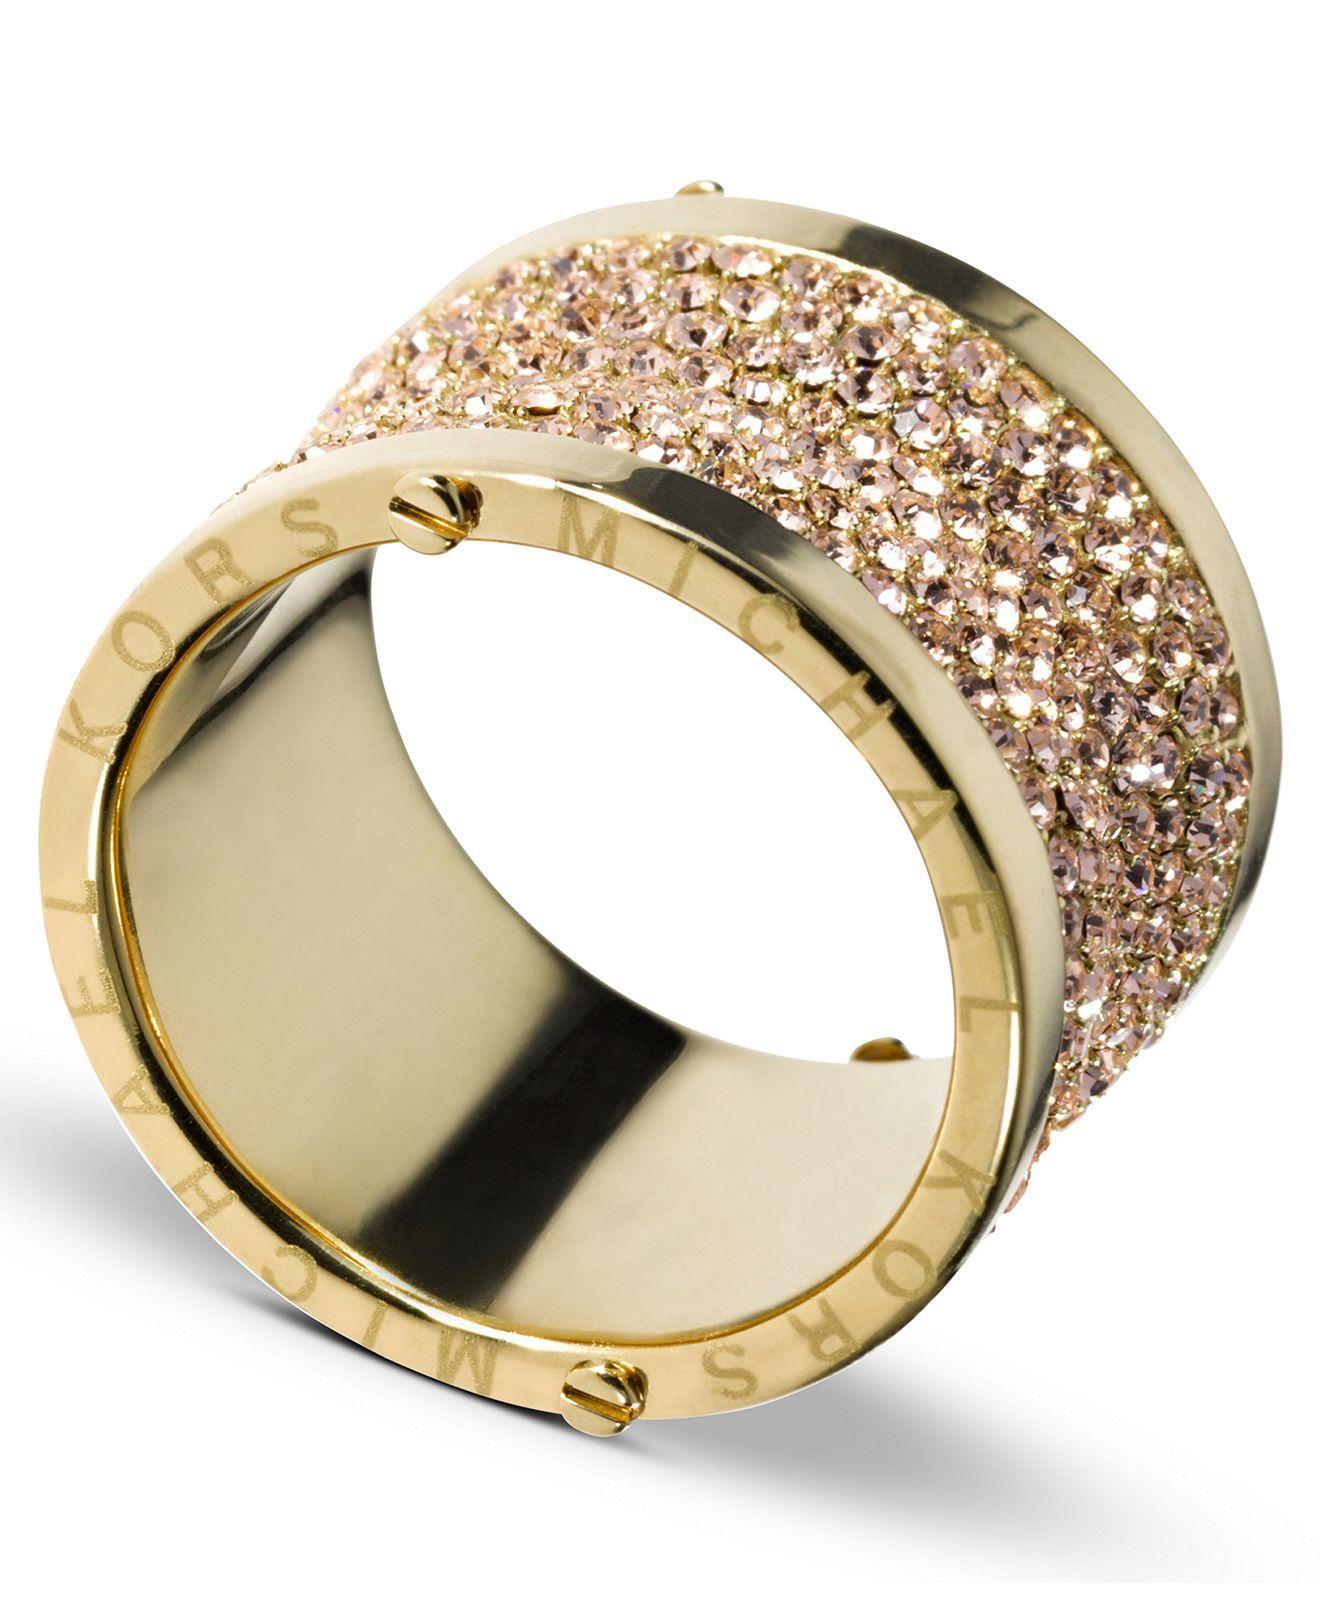 Michael Kors Ring, Gold Tone Pave Barrel Ring - Fashion ...